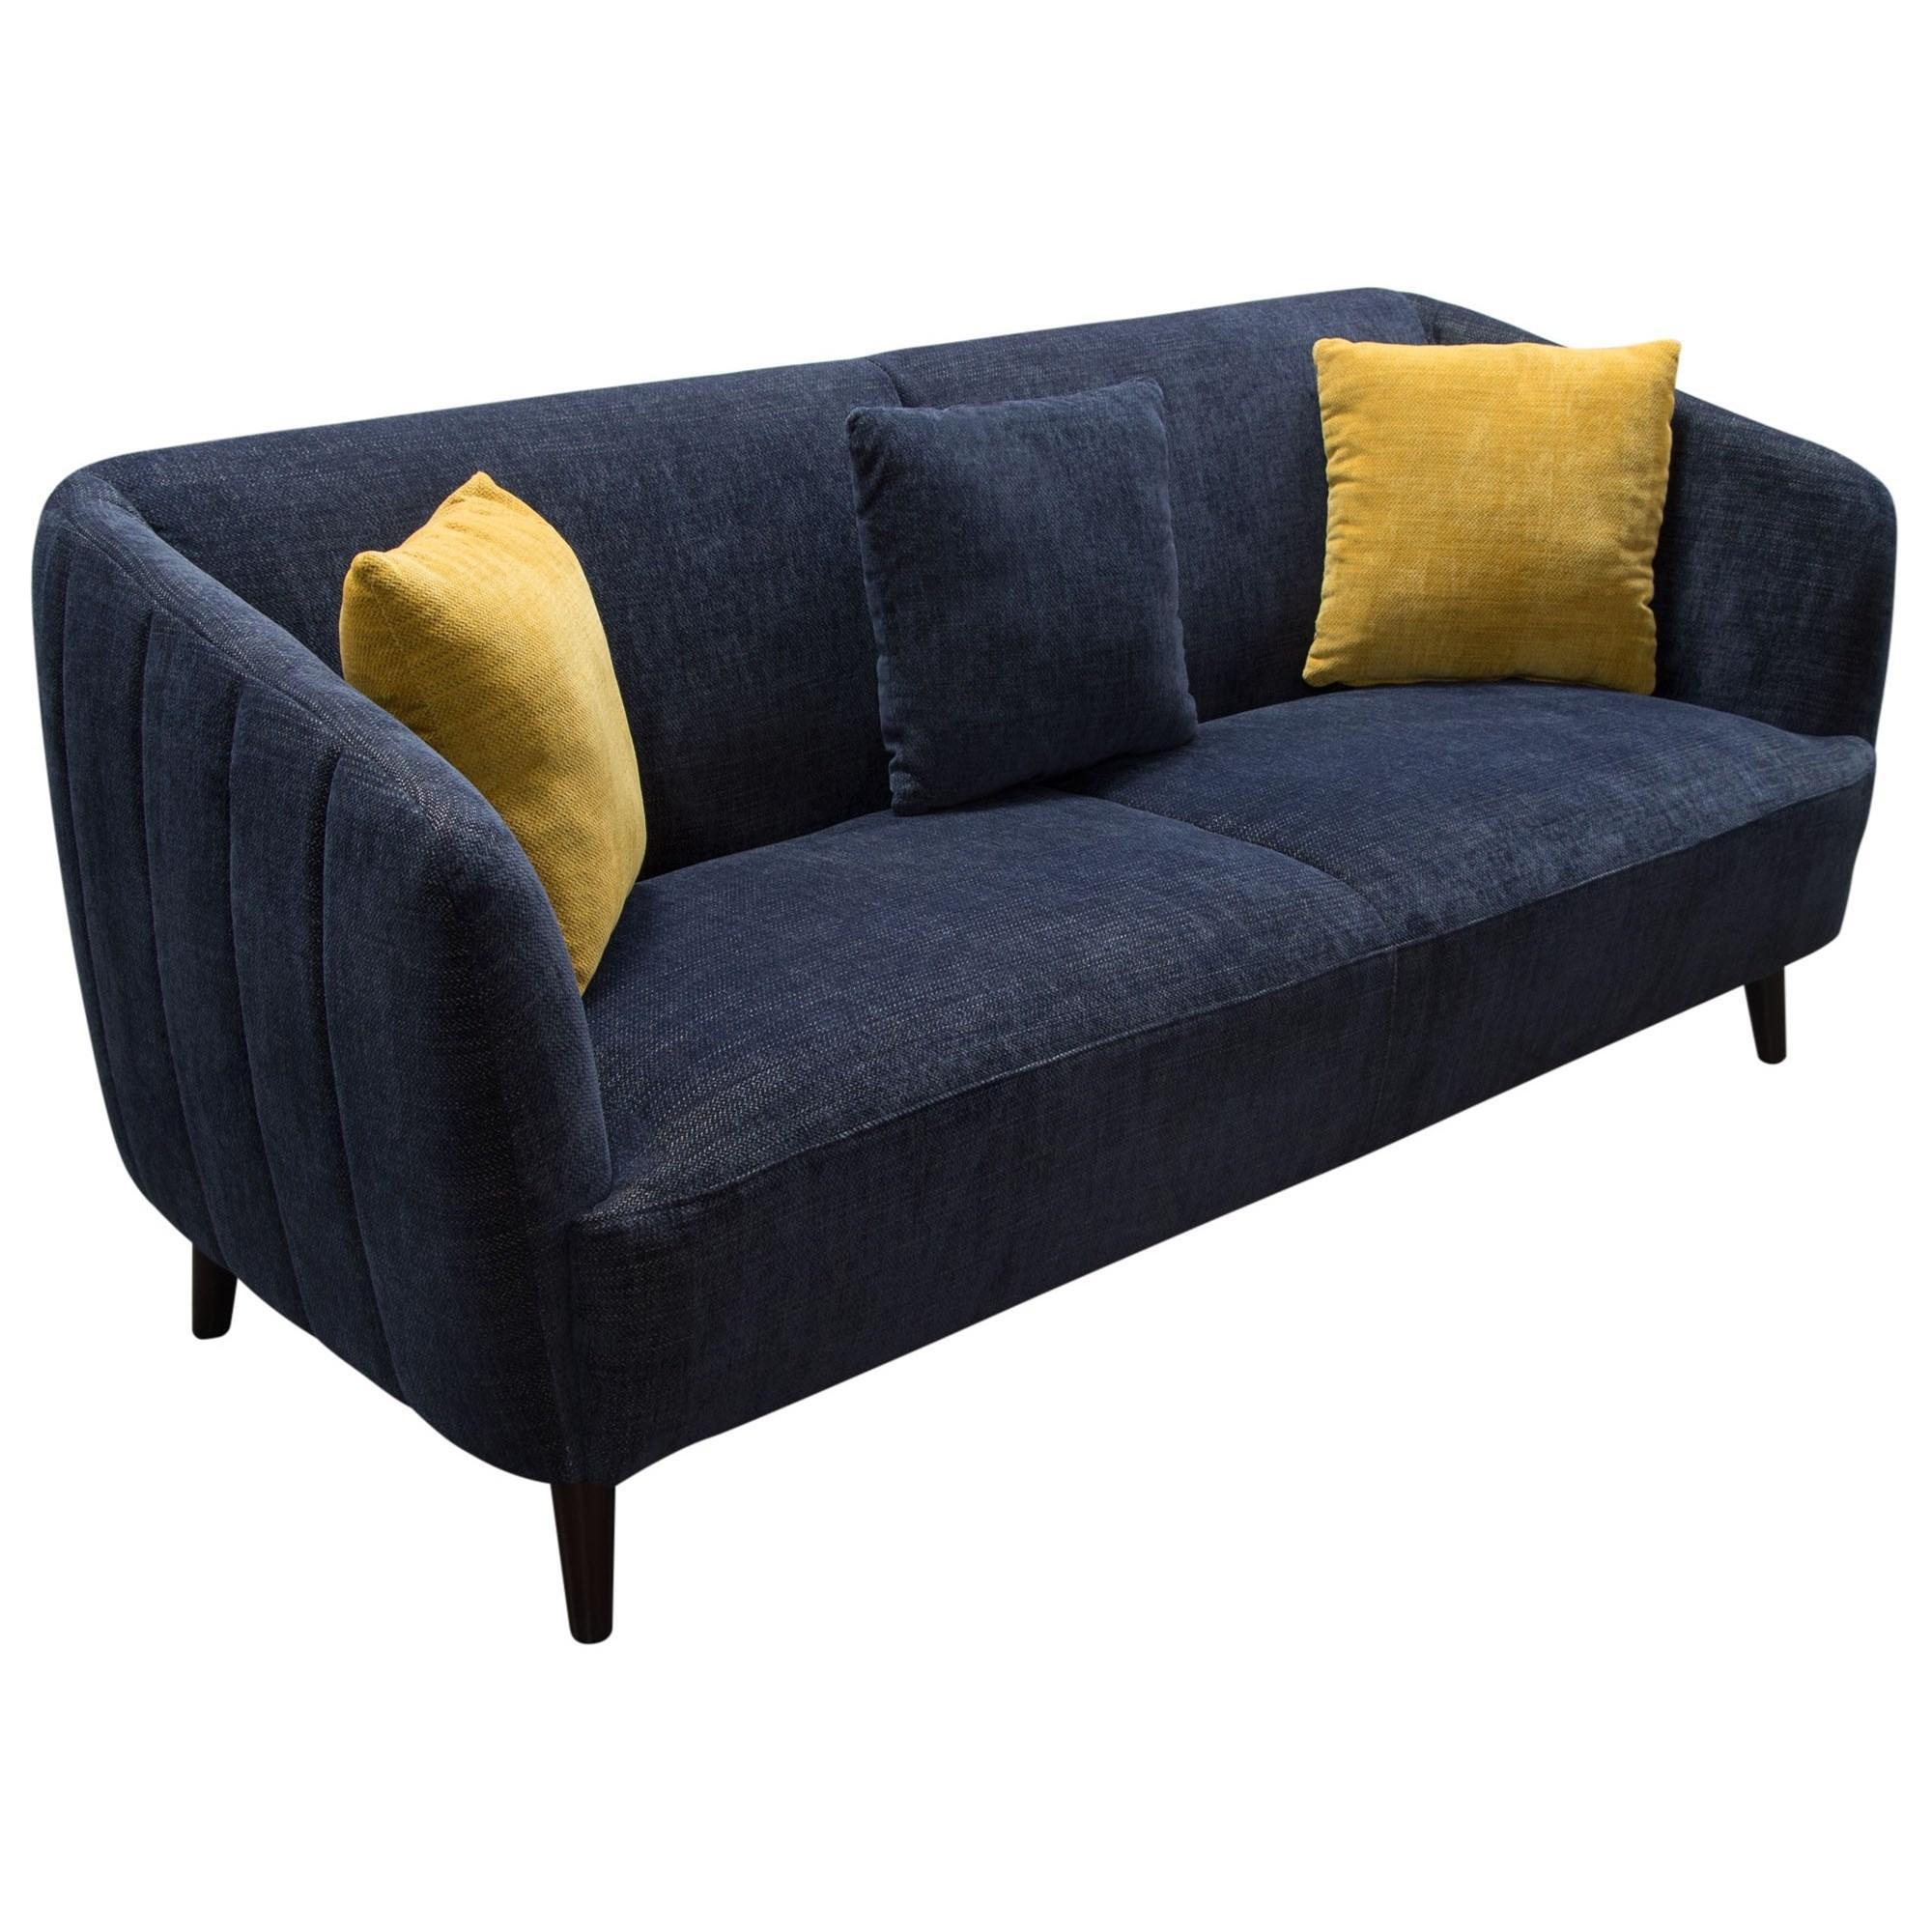 angled sofa legs wooden furniture designs diamond de luca delucasobu modern with